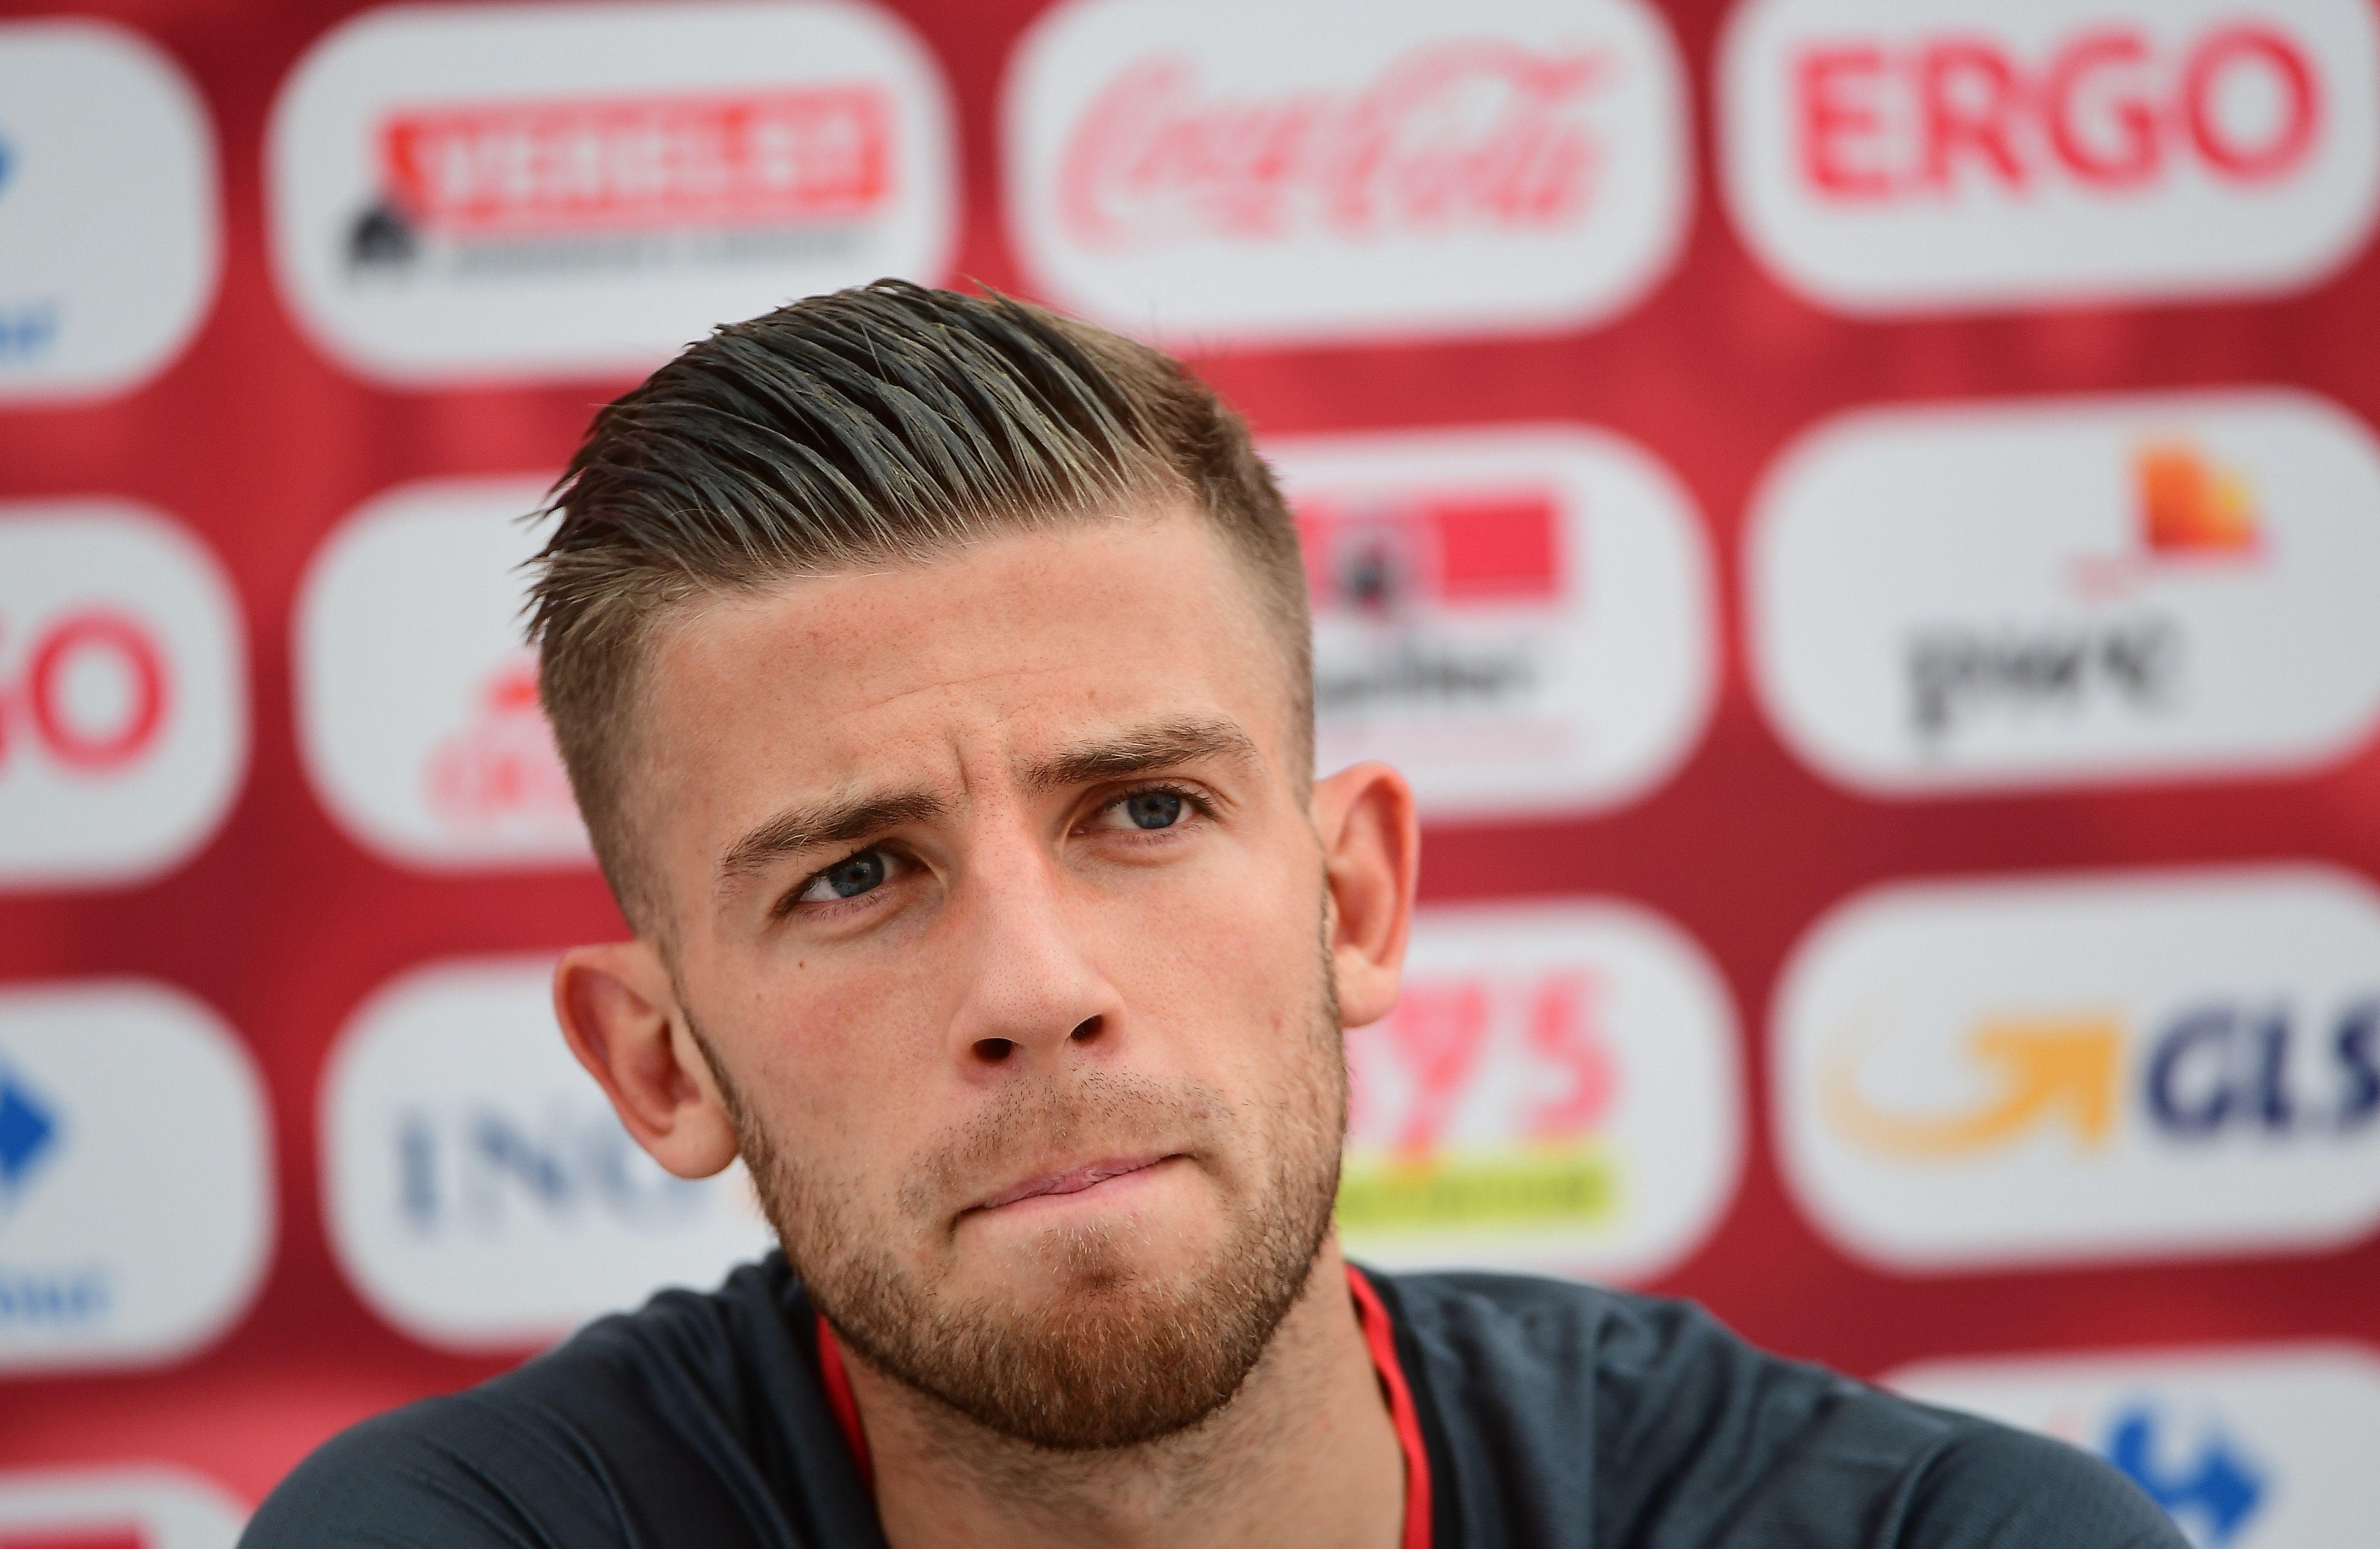 Toby Alderweireld wants Chelsea- bound Michy Batshuayi to join him at Tottenham